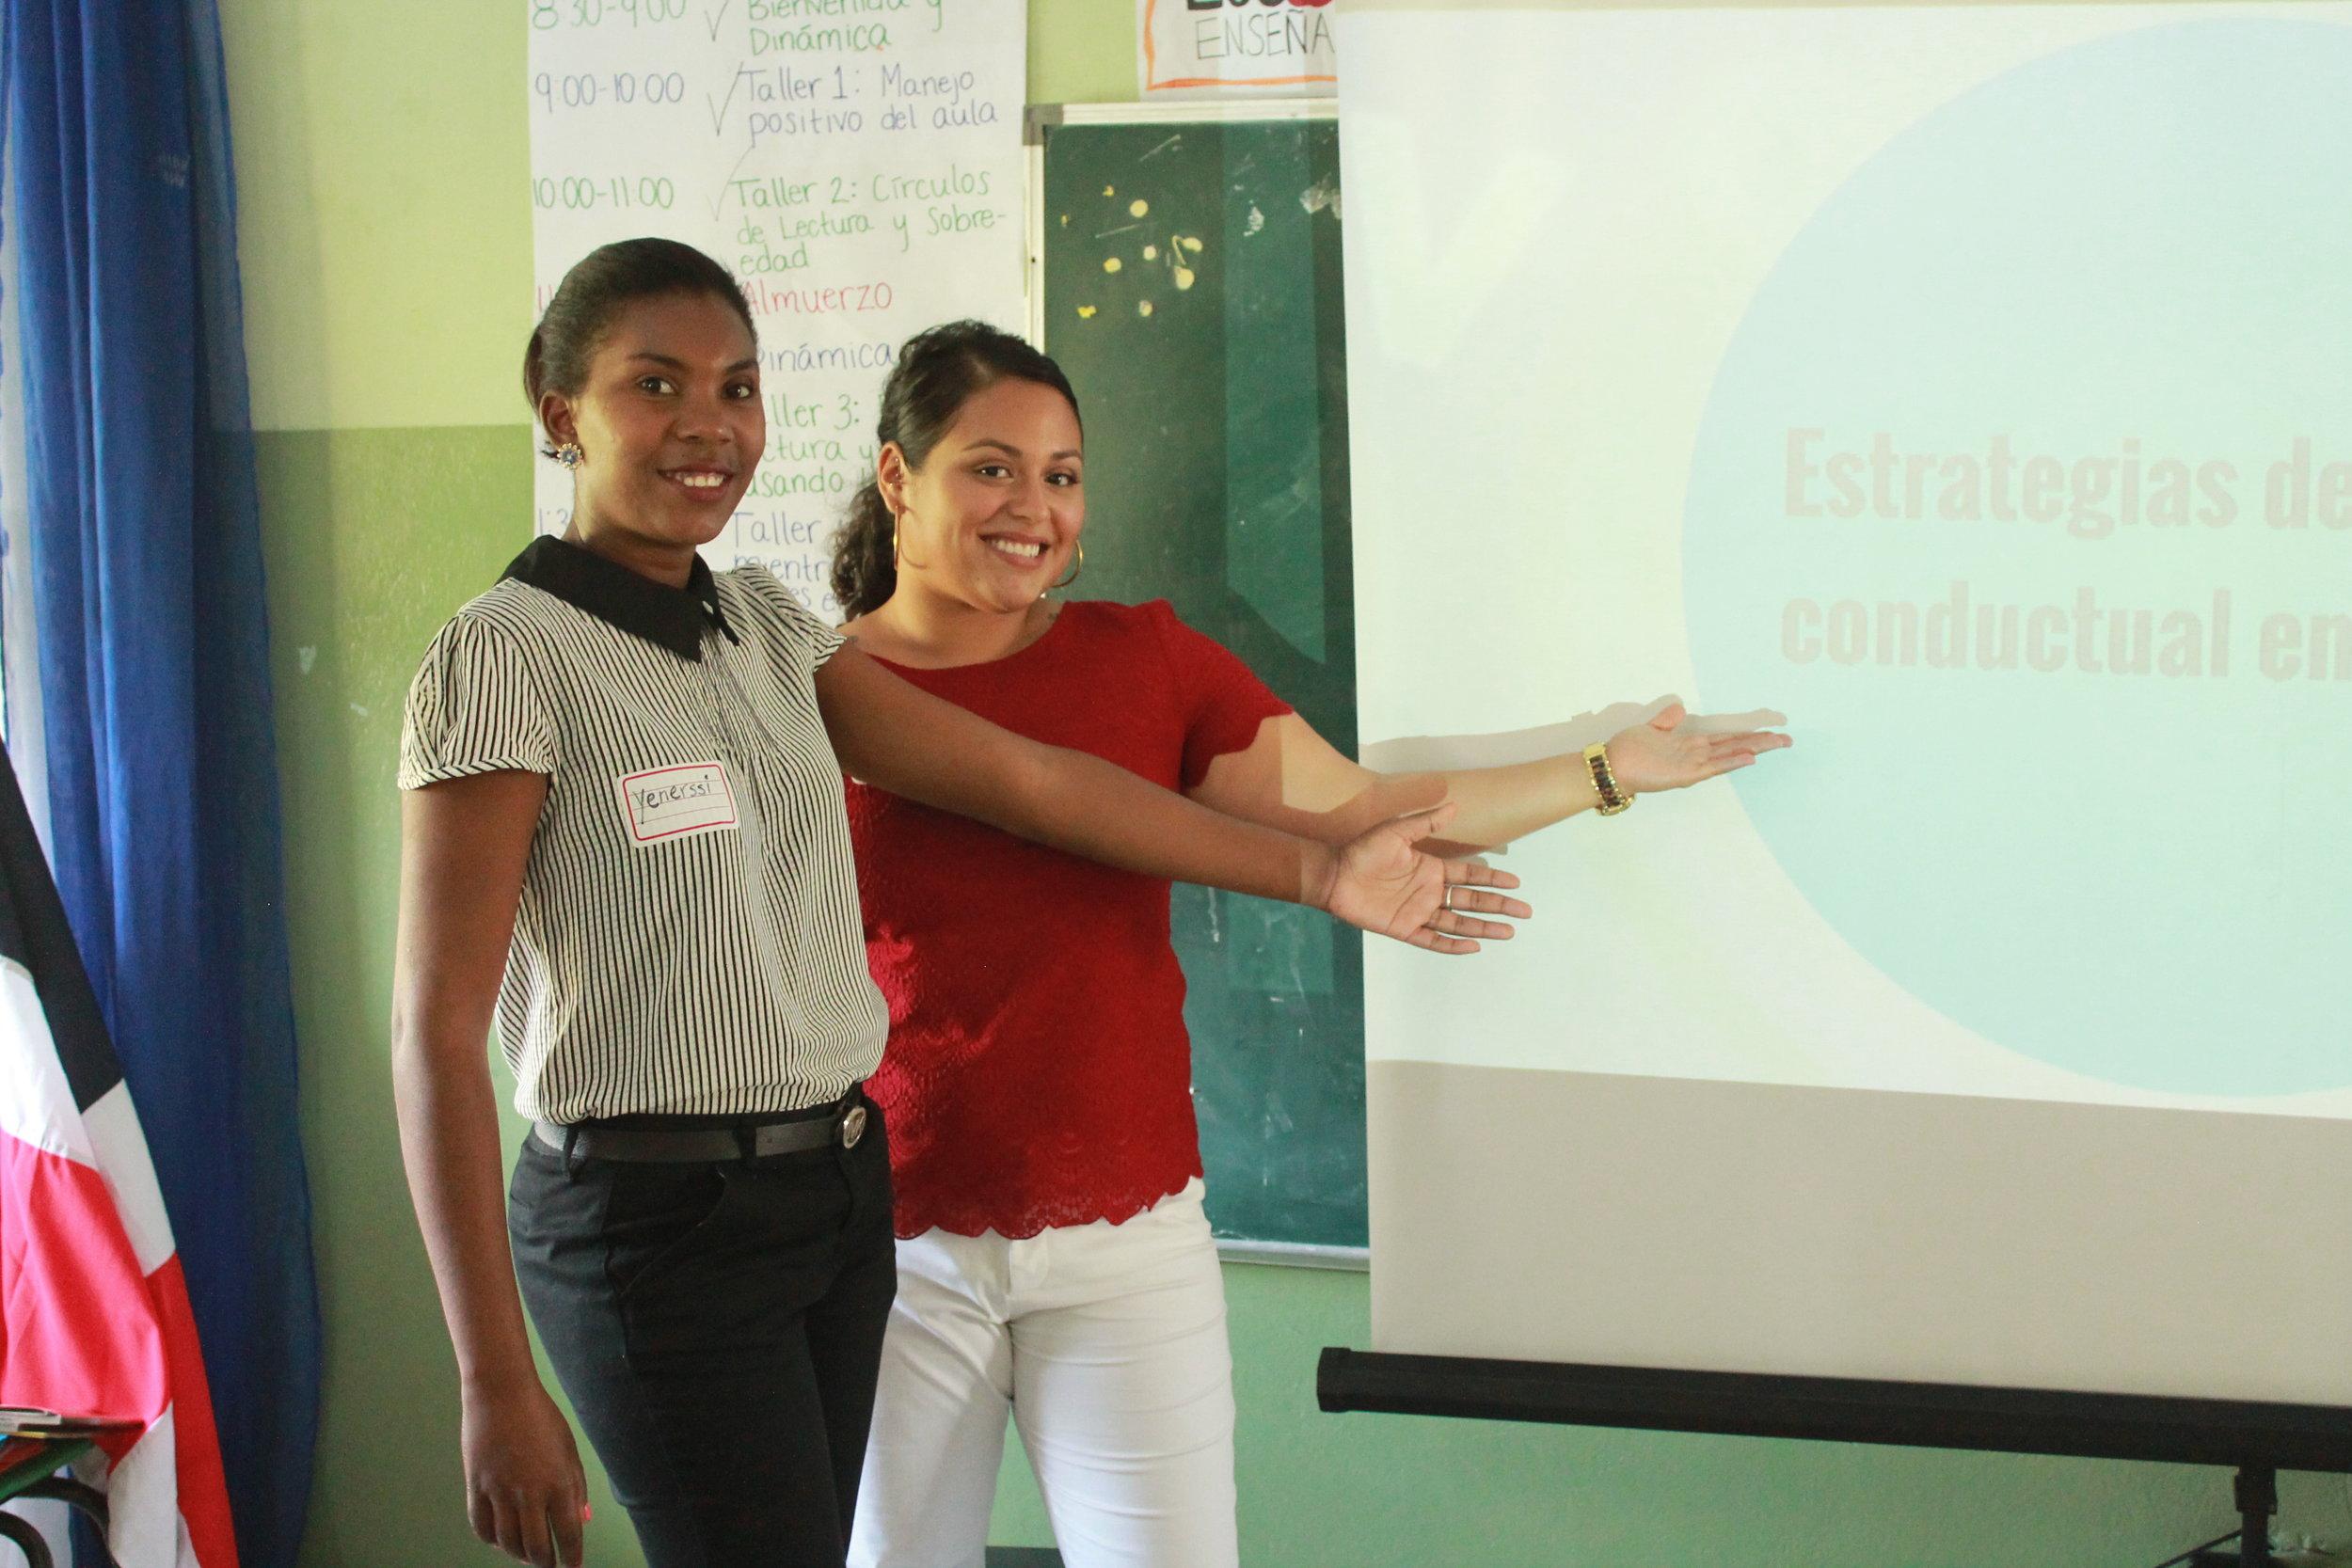 Zaira and her co-teacher presenting on classroom management.